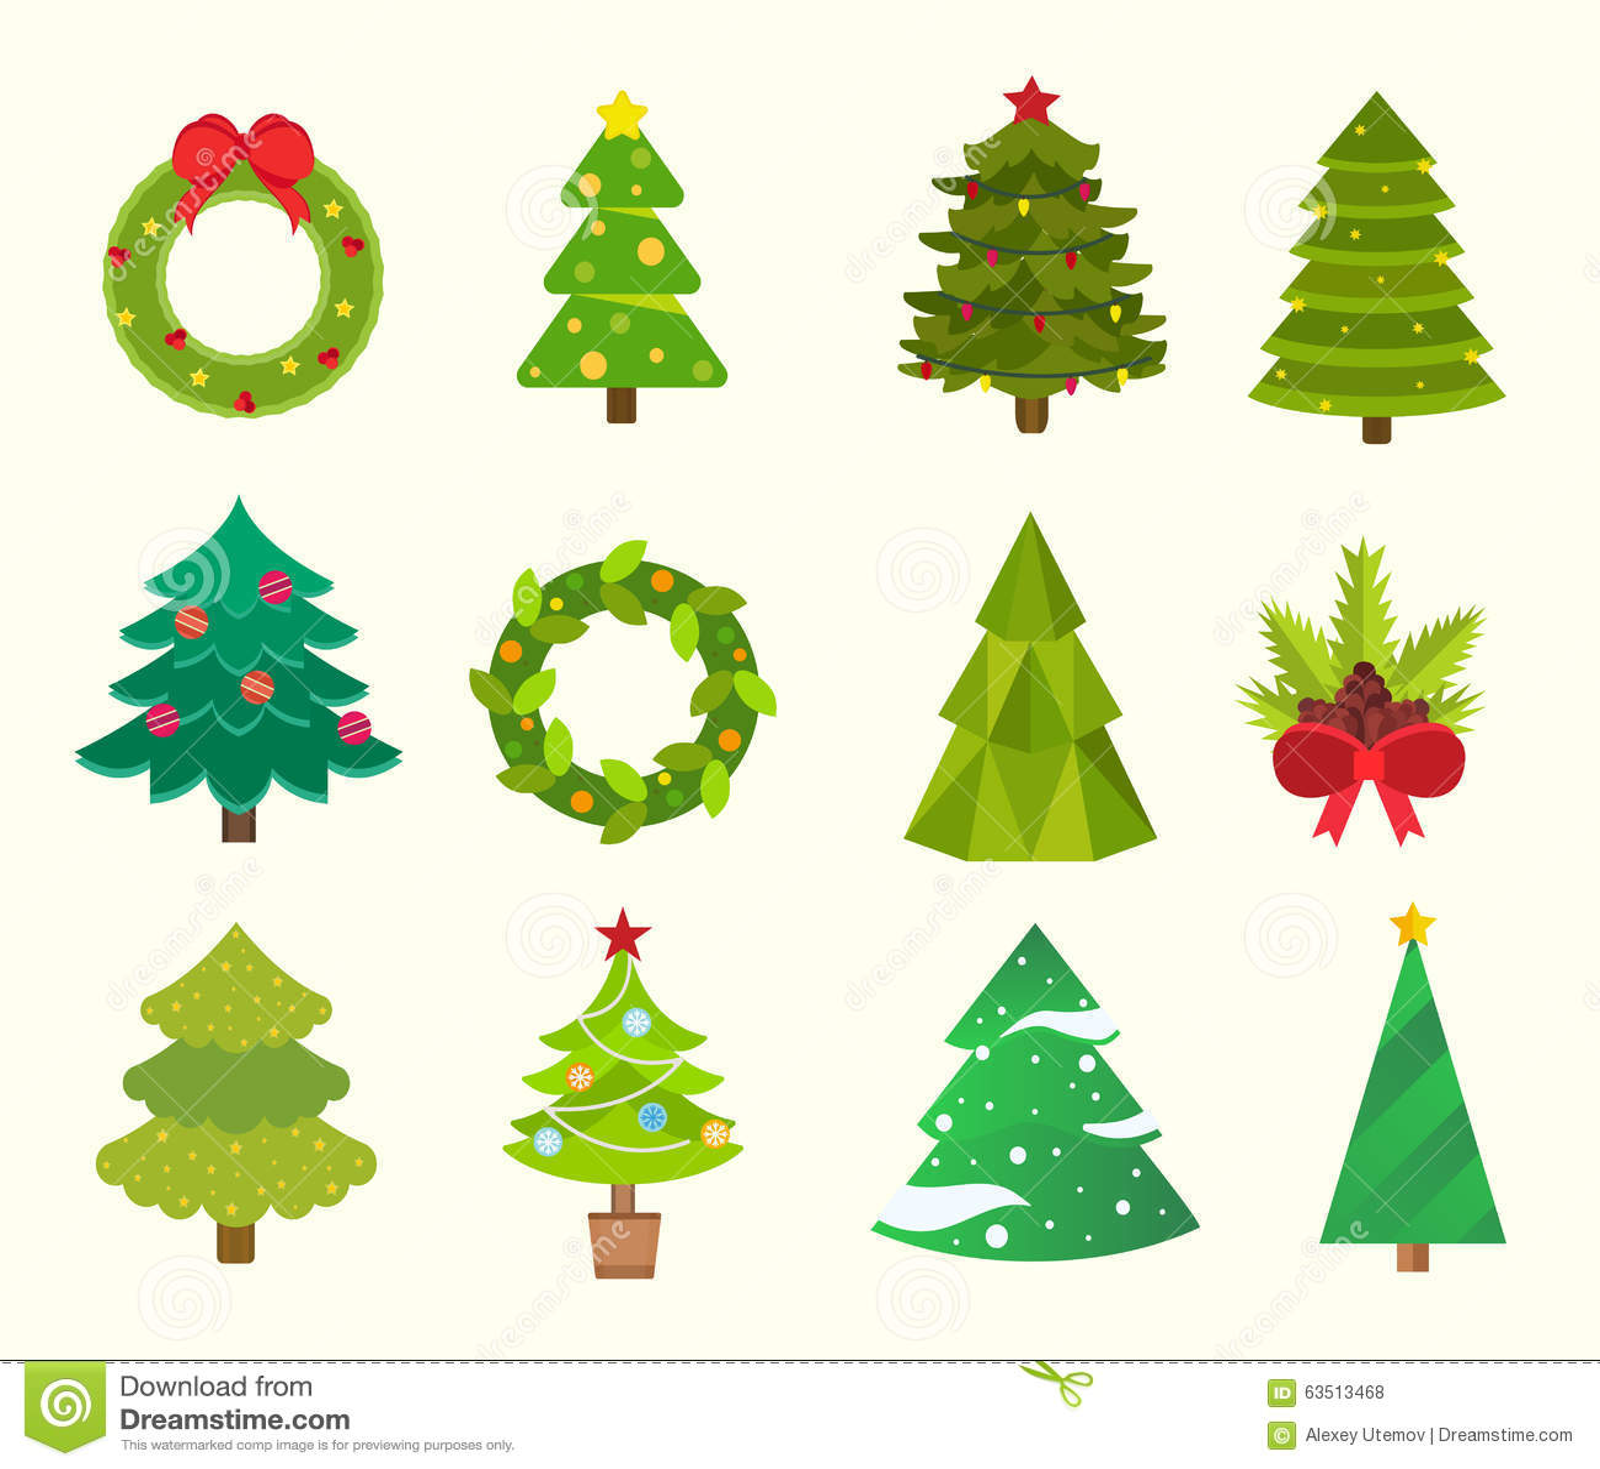 royalty free vector download christmas tree flat - Flat Christmas Tree